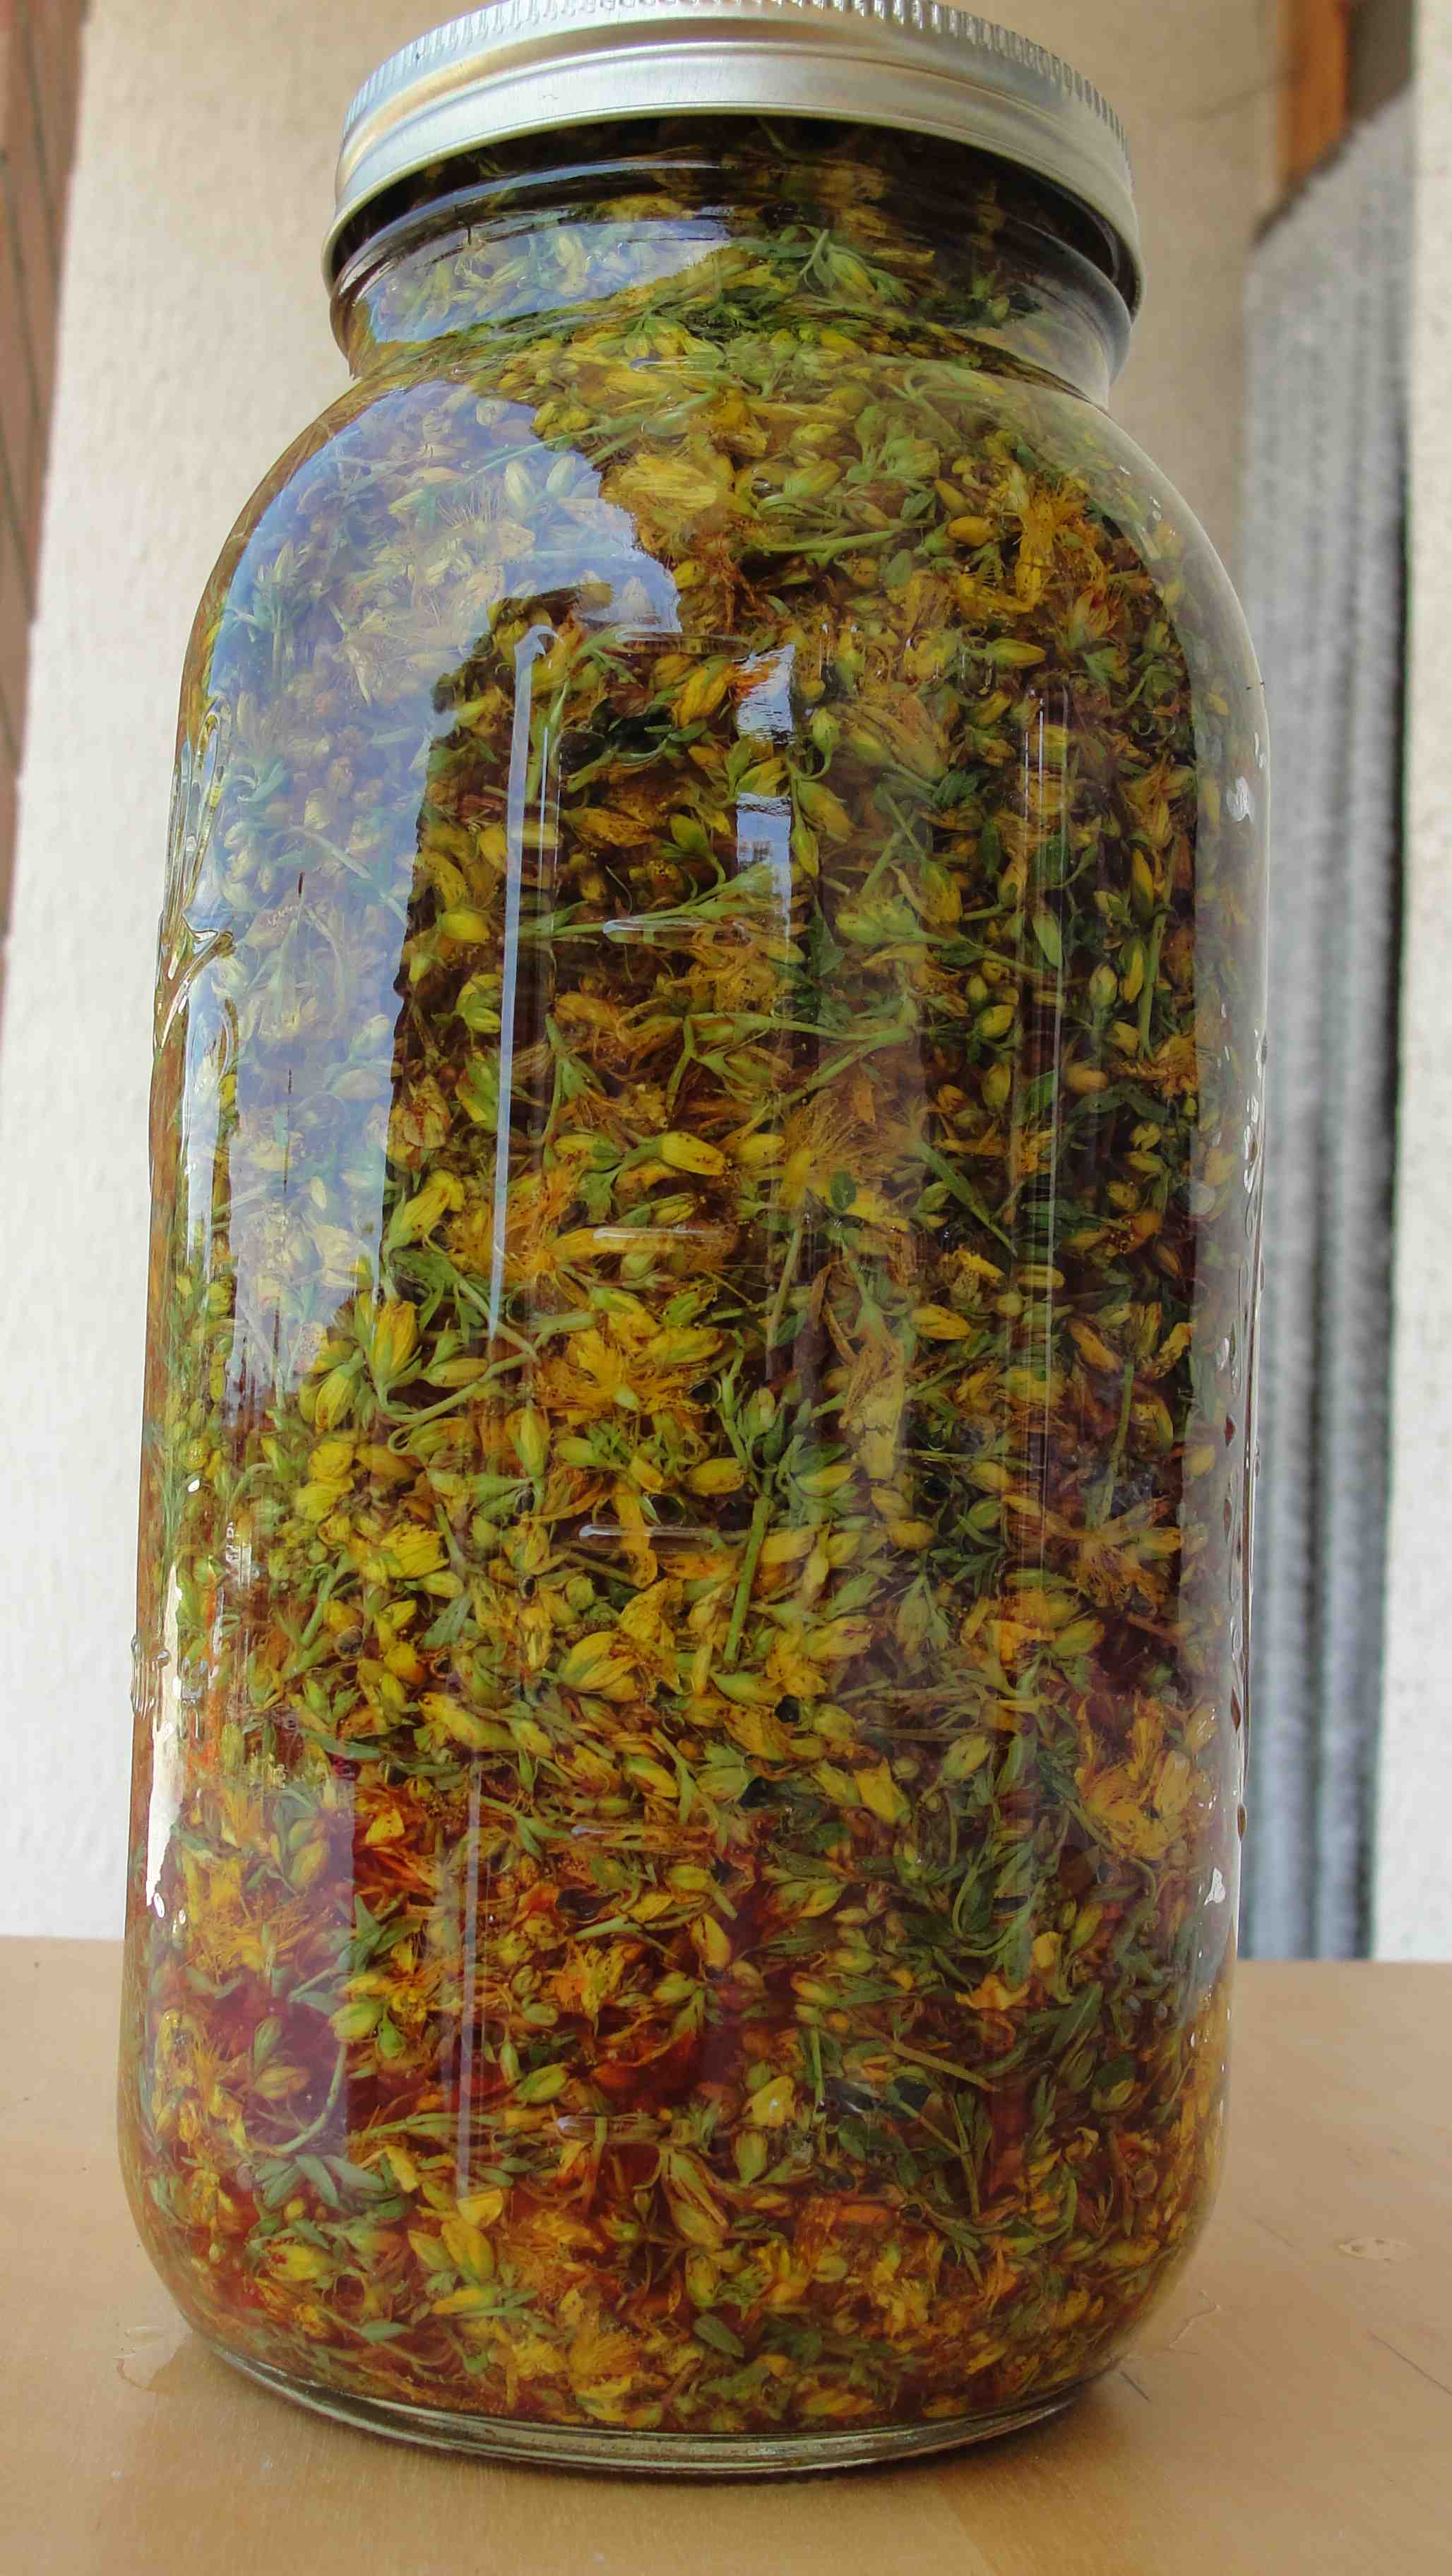 Teinture de millepertuis (Hypericum perforatum) - macération Jour 1 - Photo AltheaProvence